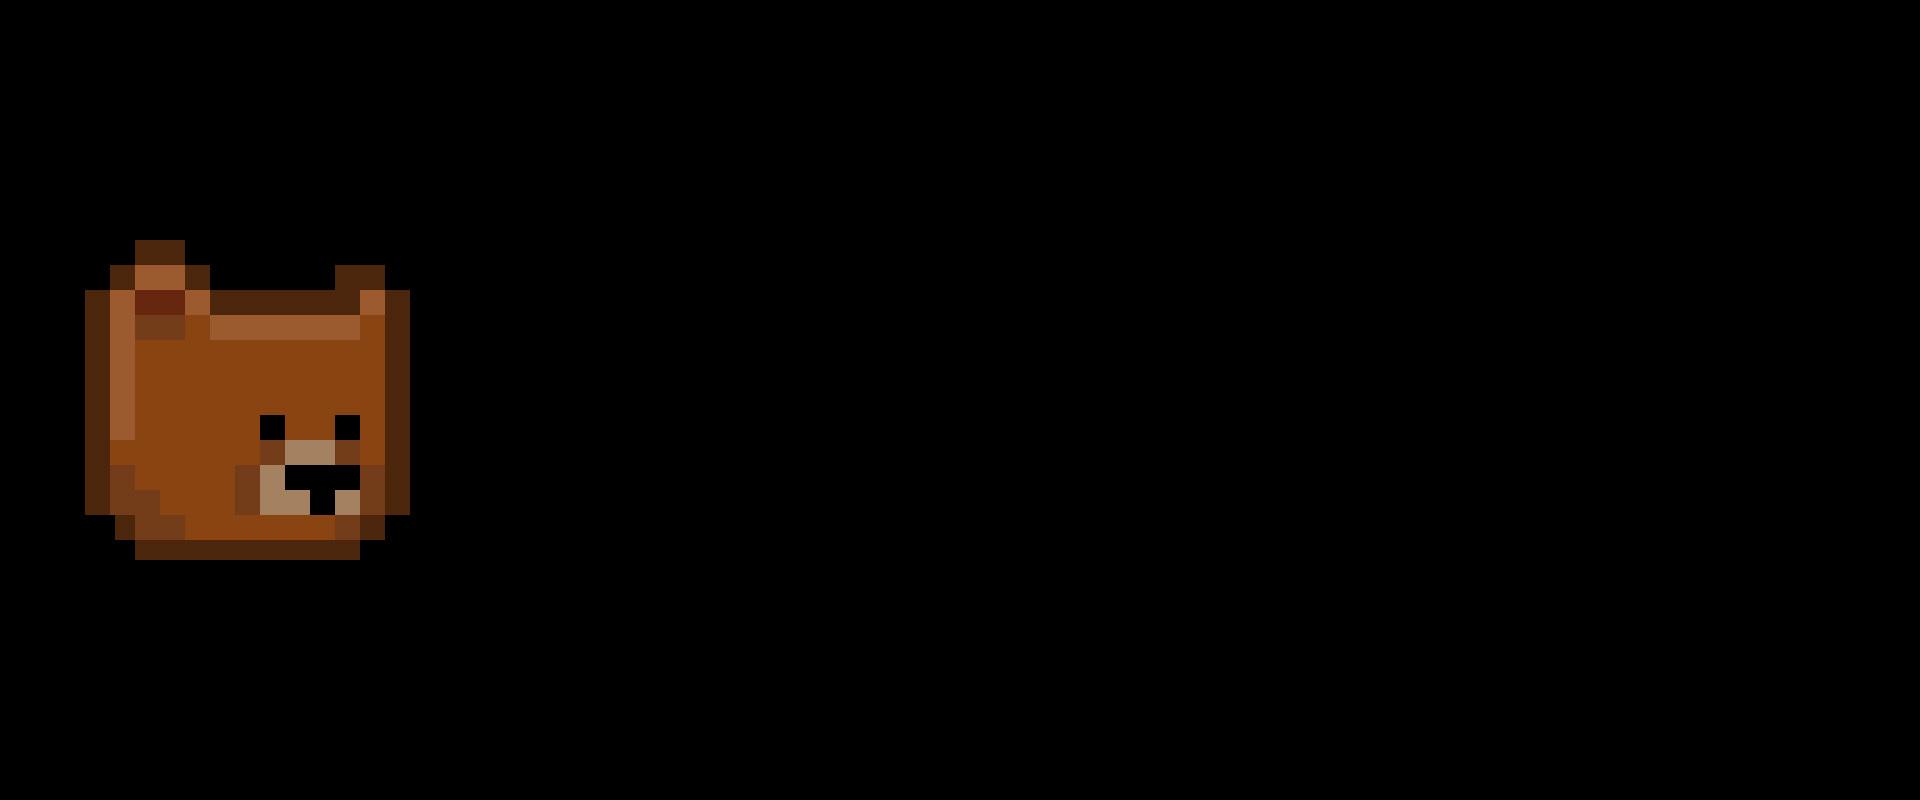 BEAR (Profile Background)